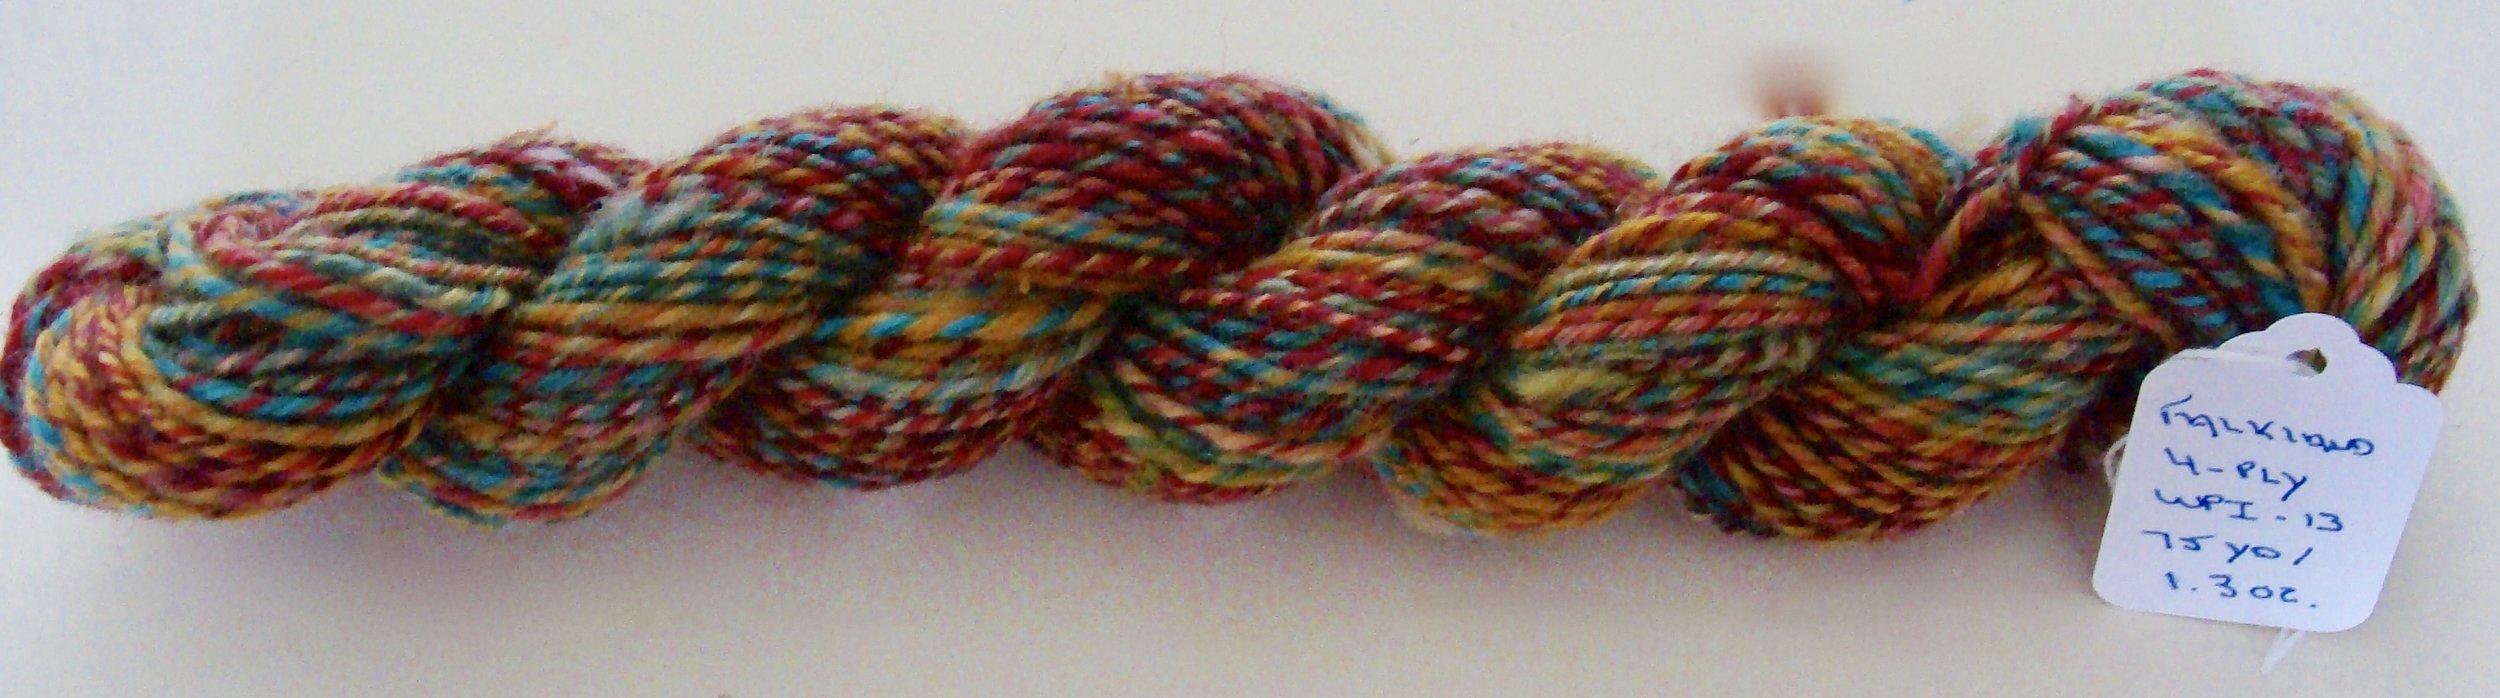 4 ply handspun Falkland wool yarn